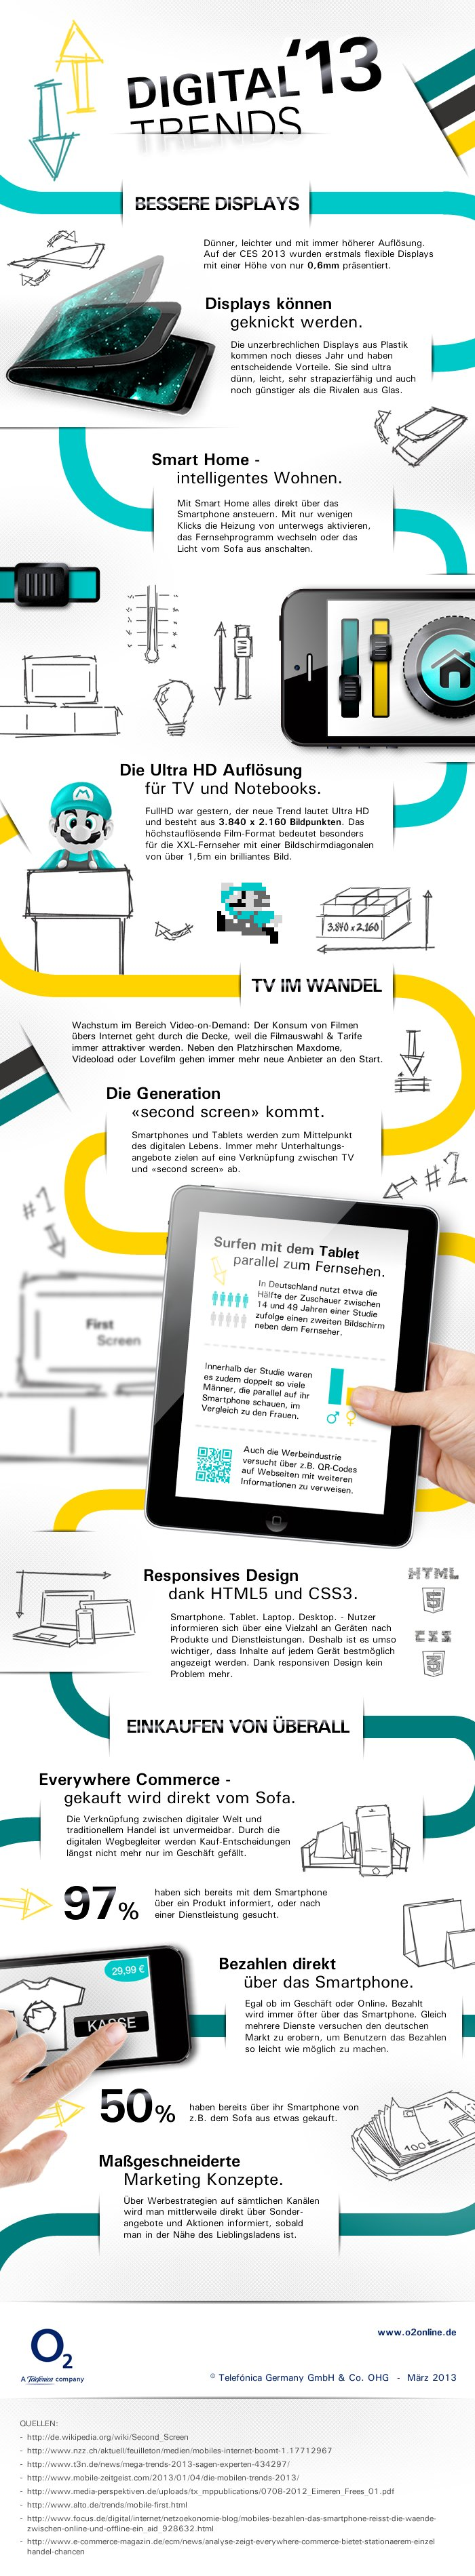 Digitale-Trends-2013